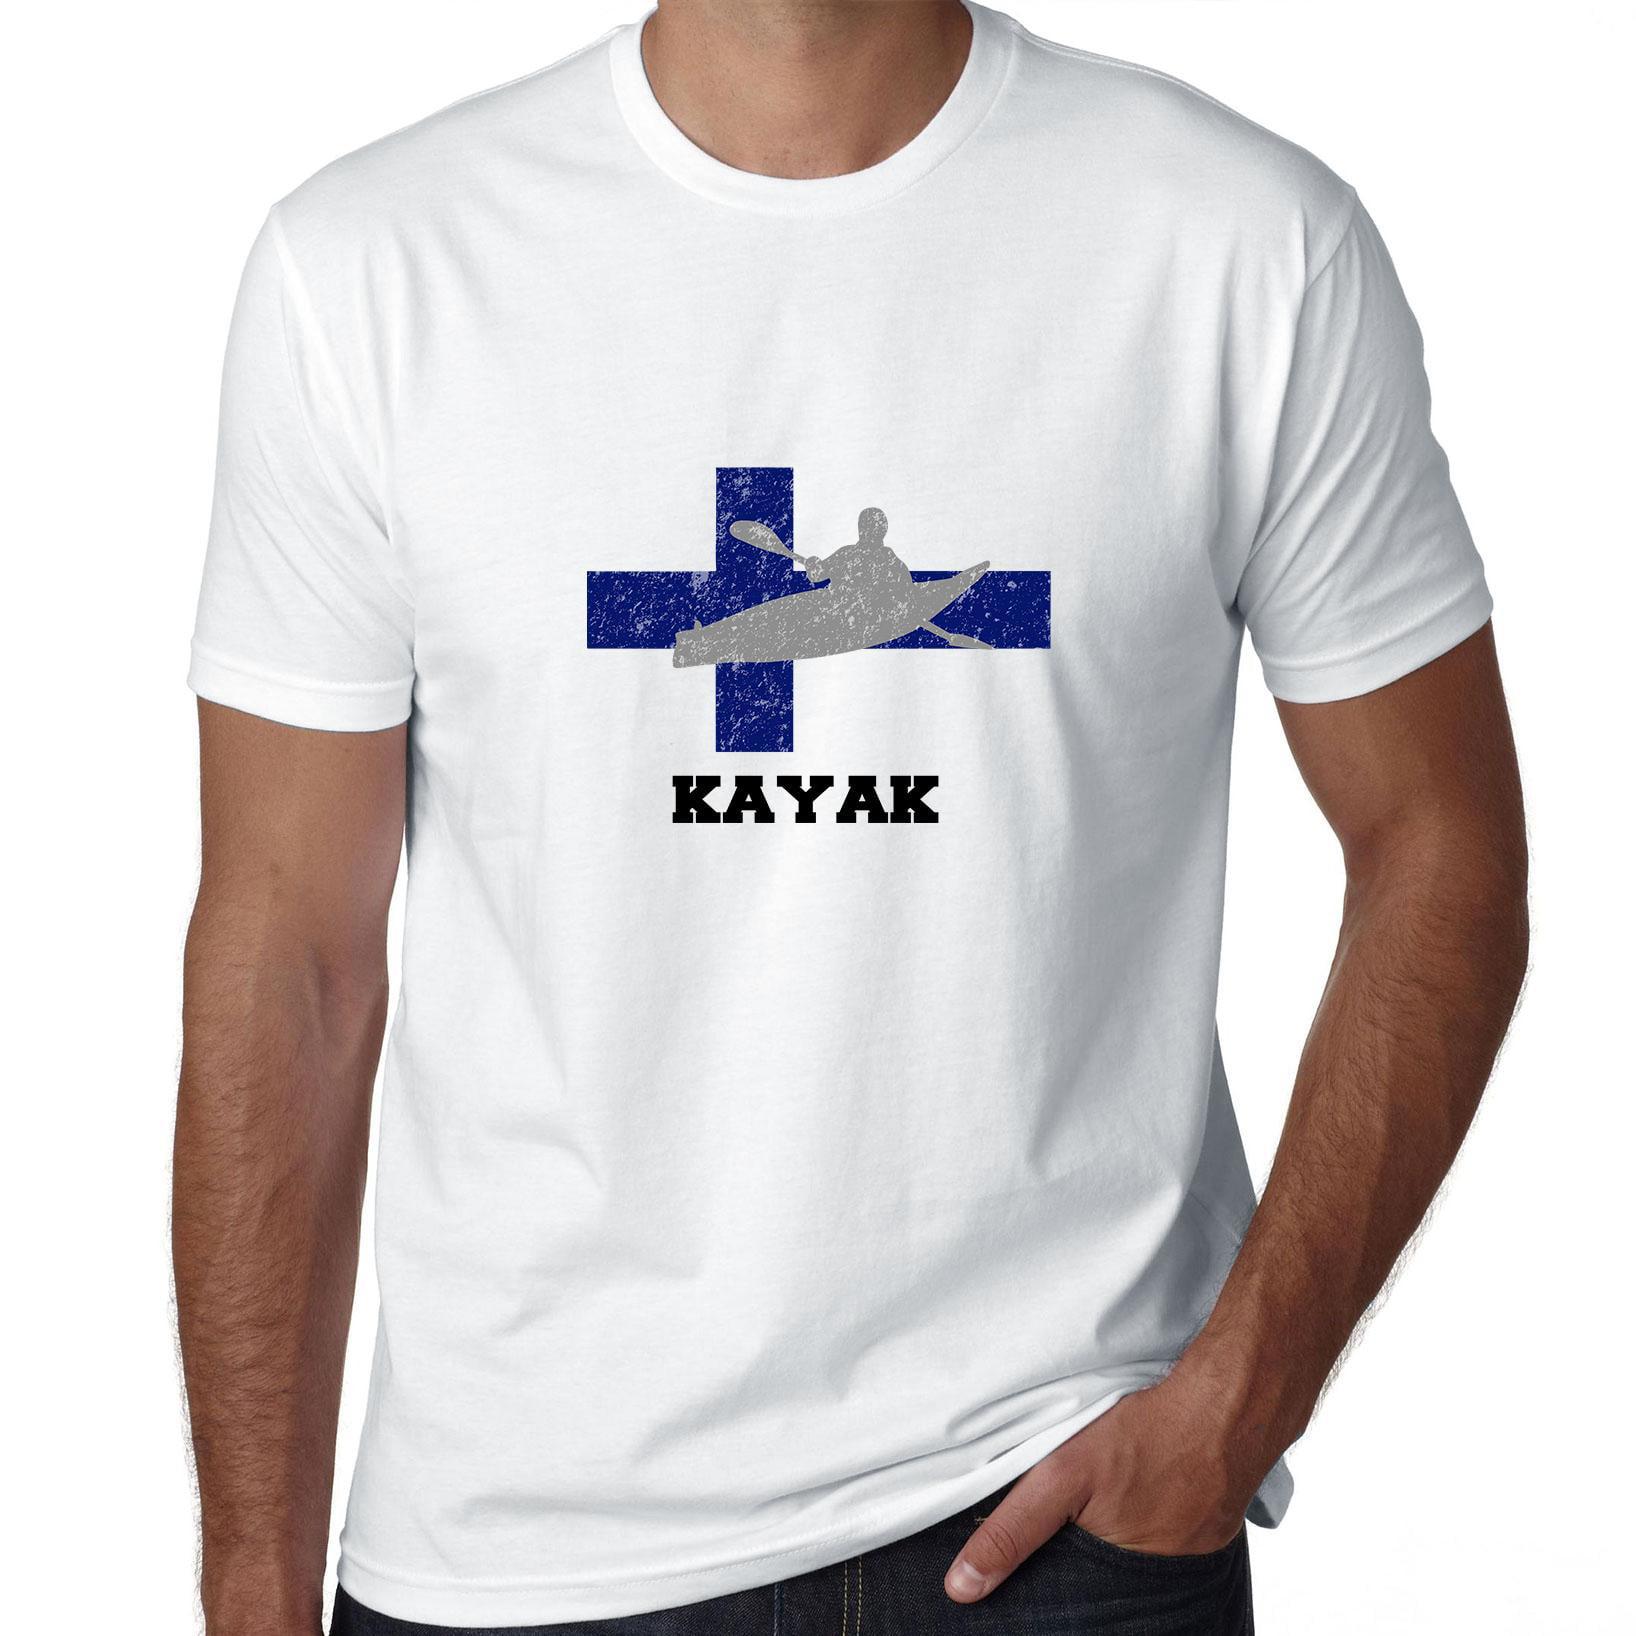 Finland Olympic - Kayak- Flag - Silhouette Men's T-Shirt